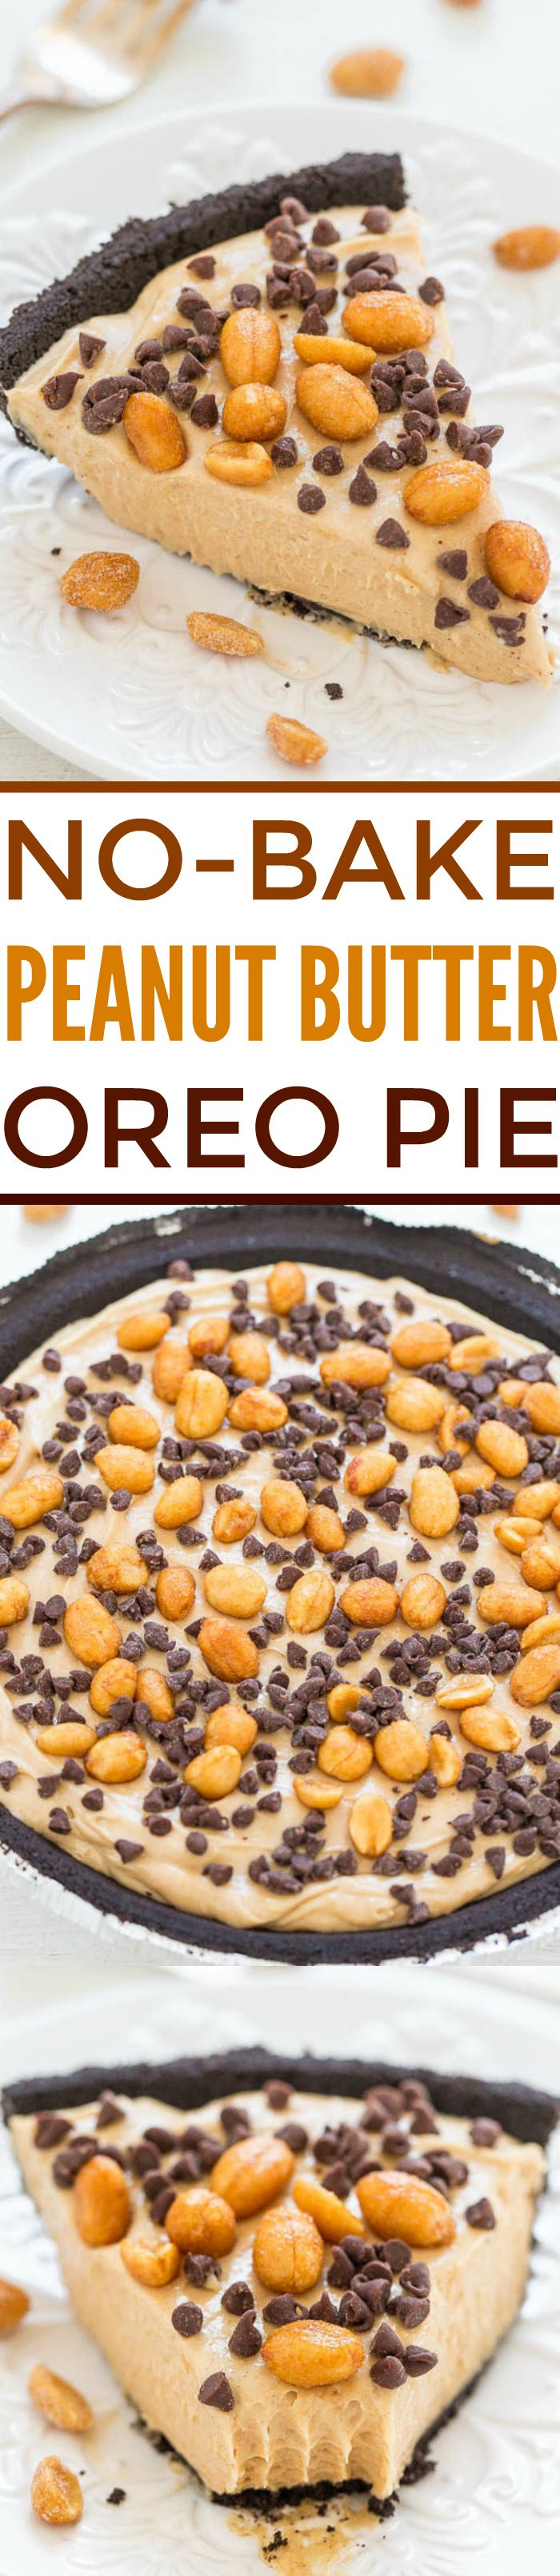 No-Bake Peanut Butter Silk Oreo Pie